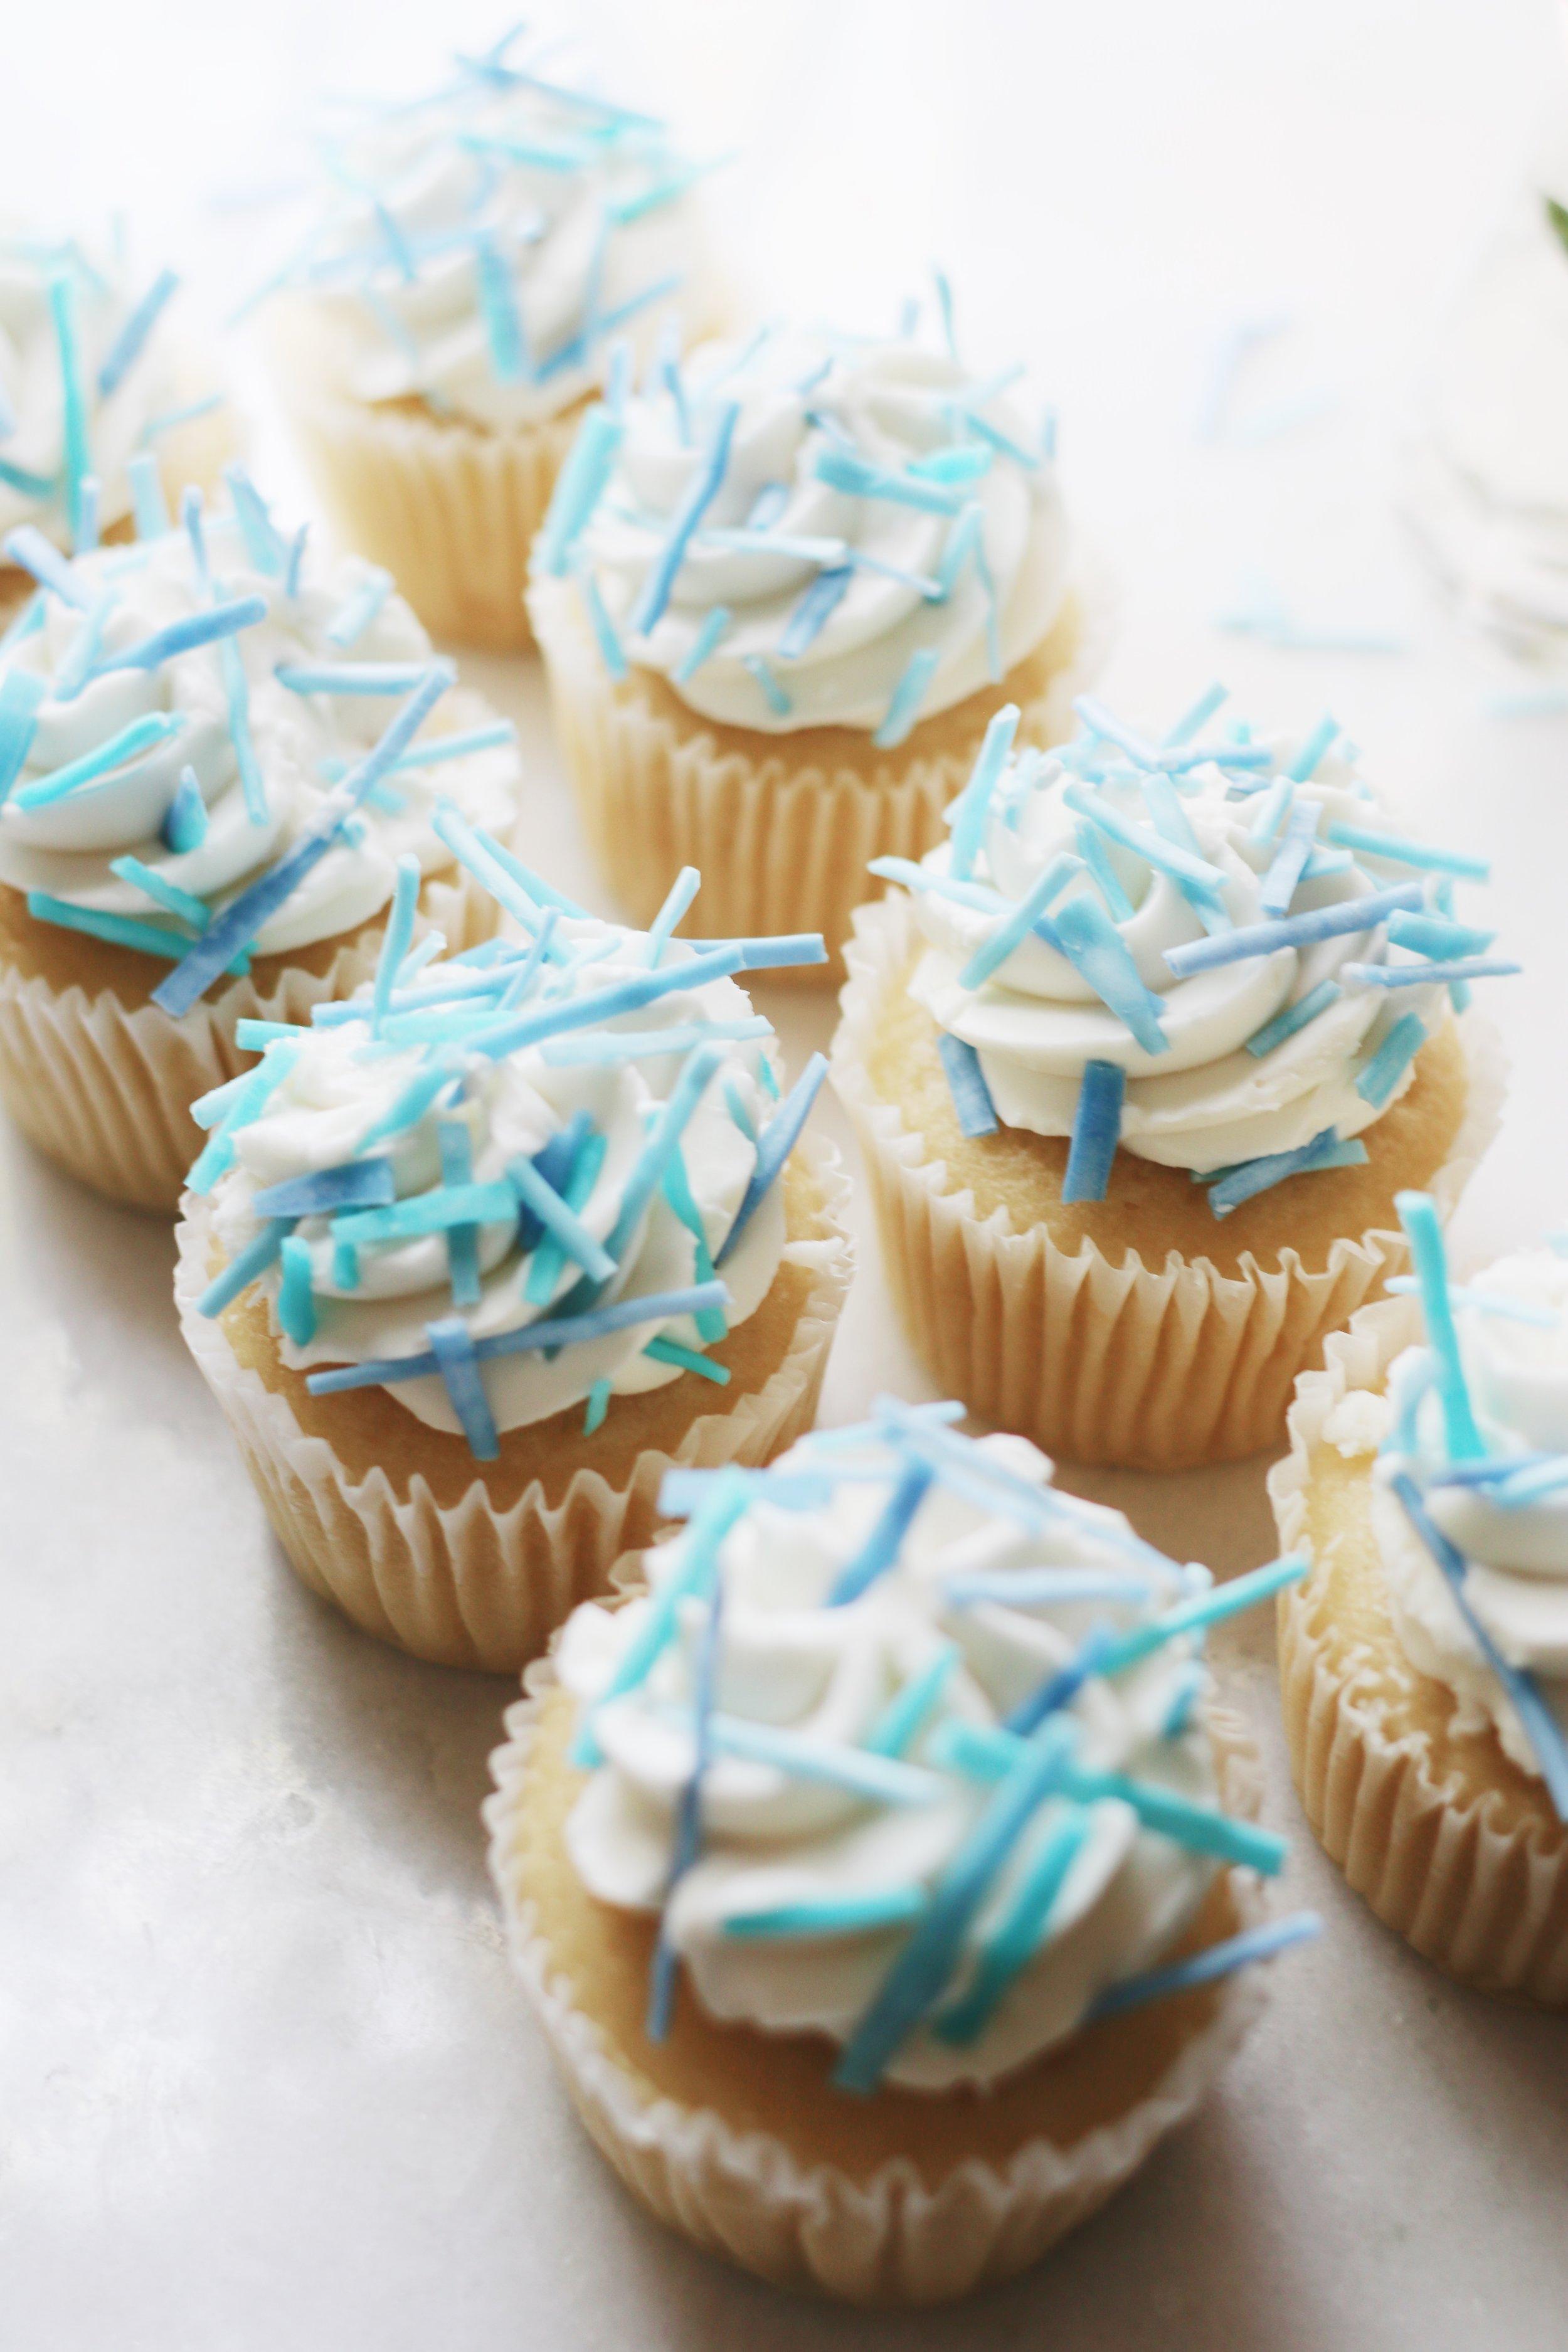 hanukkah-cupcakes-homemade-sprinkles-recipe-42.JPG